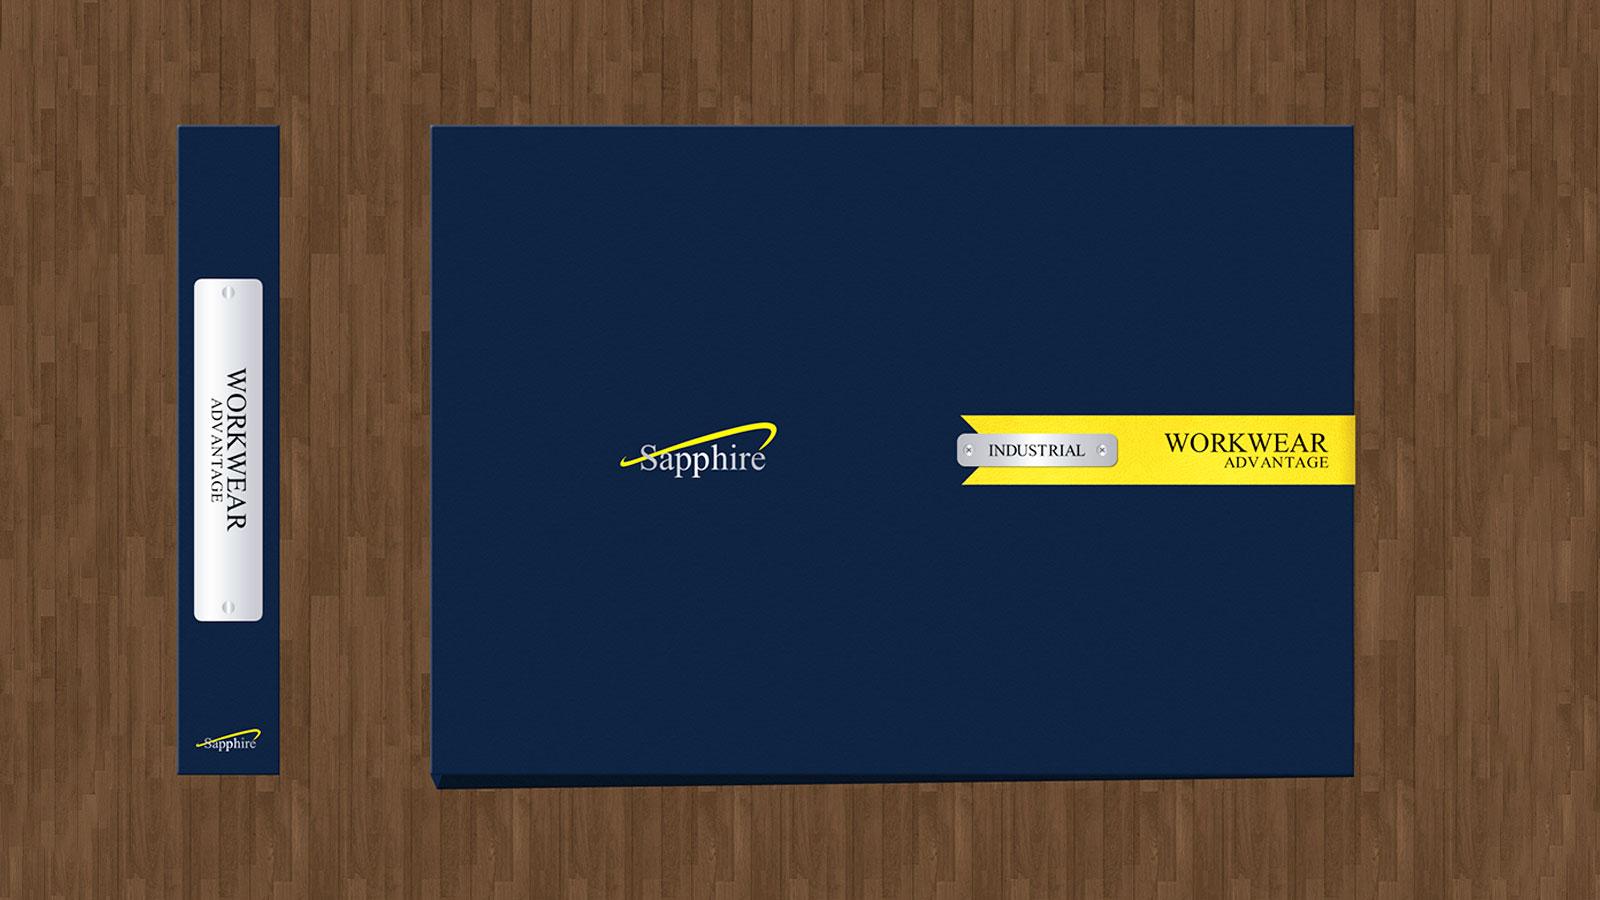 sapphire-textiles-graphic-brand-design-web-designer-hiline-lahore-pakistan-020